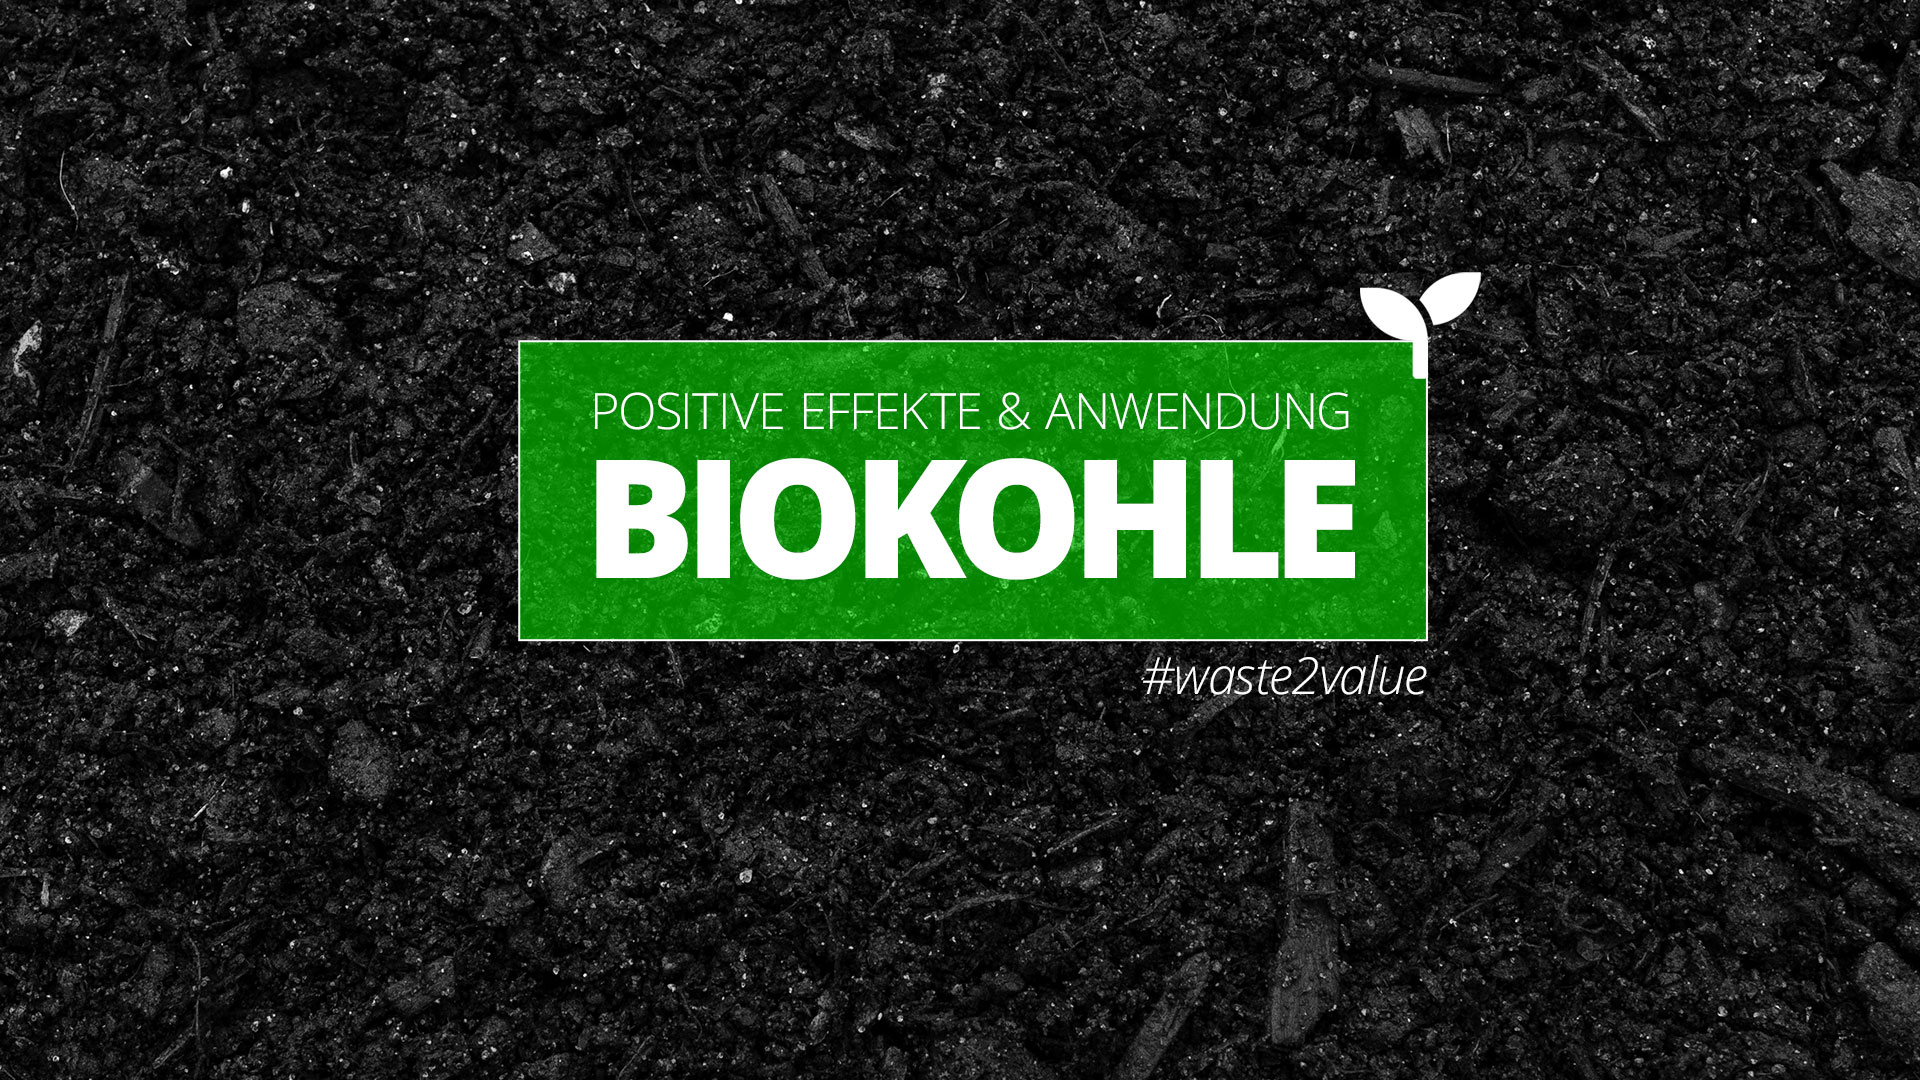 Pflanzenkohle & Biokohle: Positive Effekte